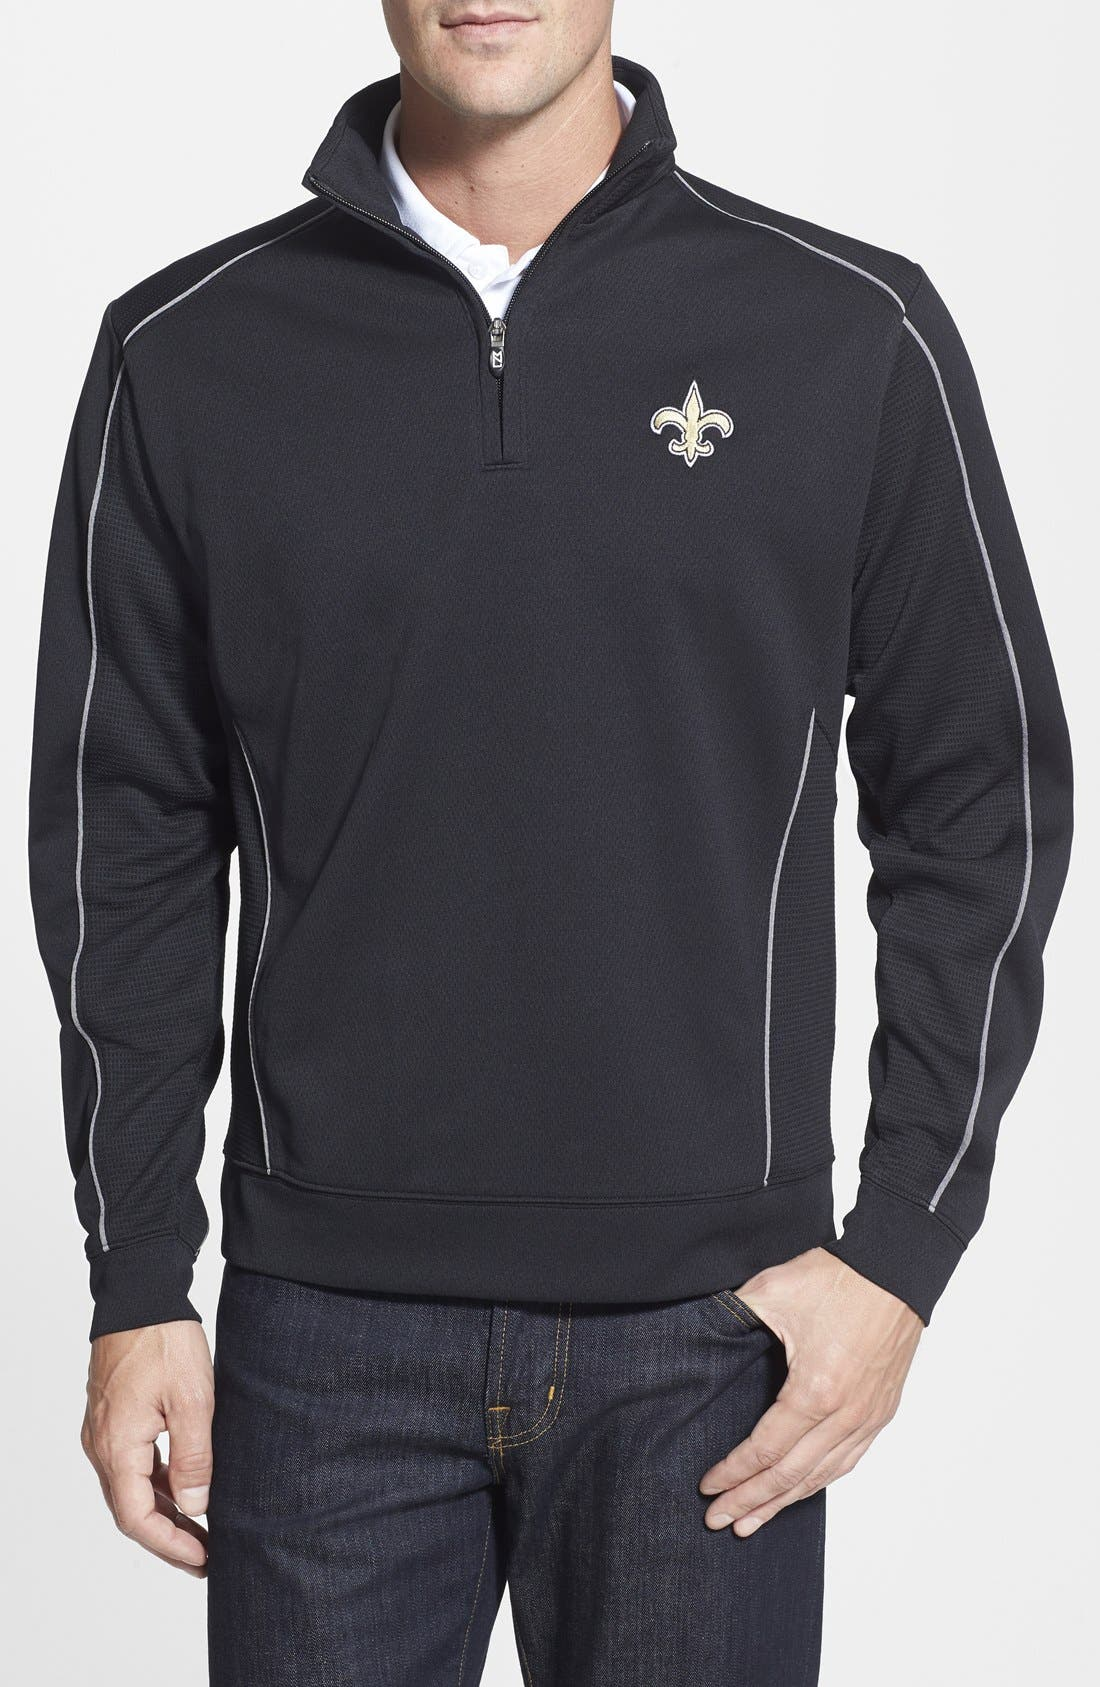 New Orleans Saints - Edge DryTec Moisture Wicking Half Zip Pullover,                         Main,                         color, Black